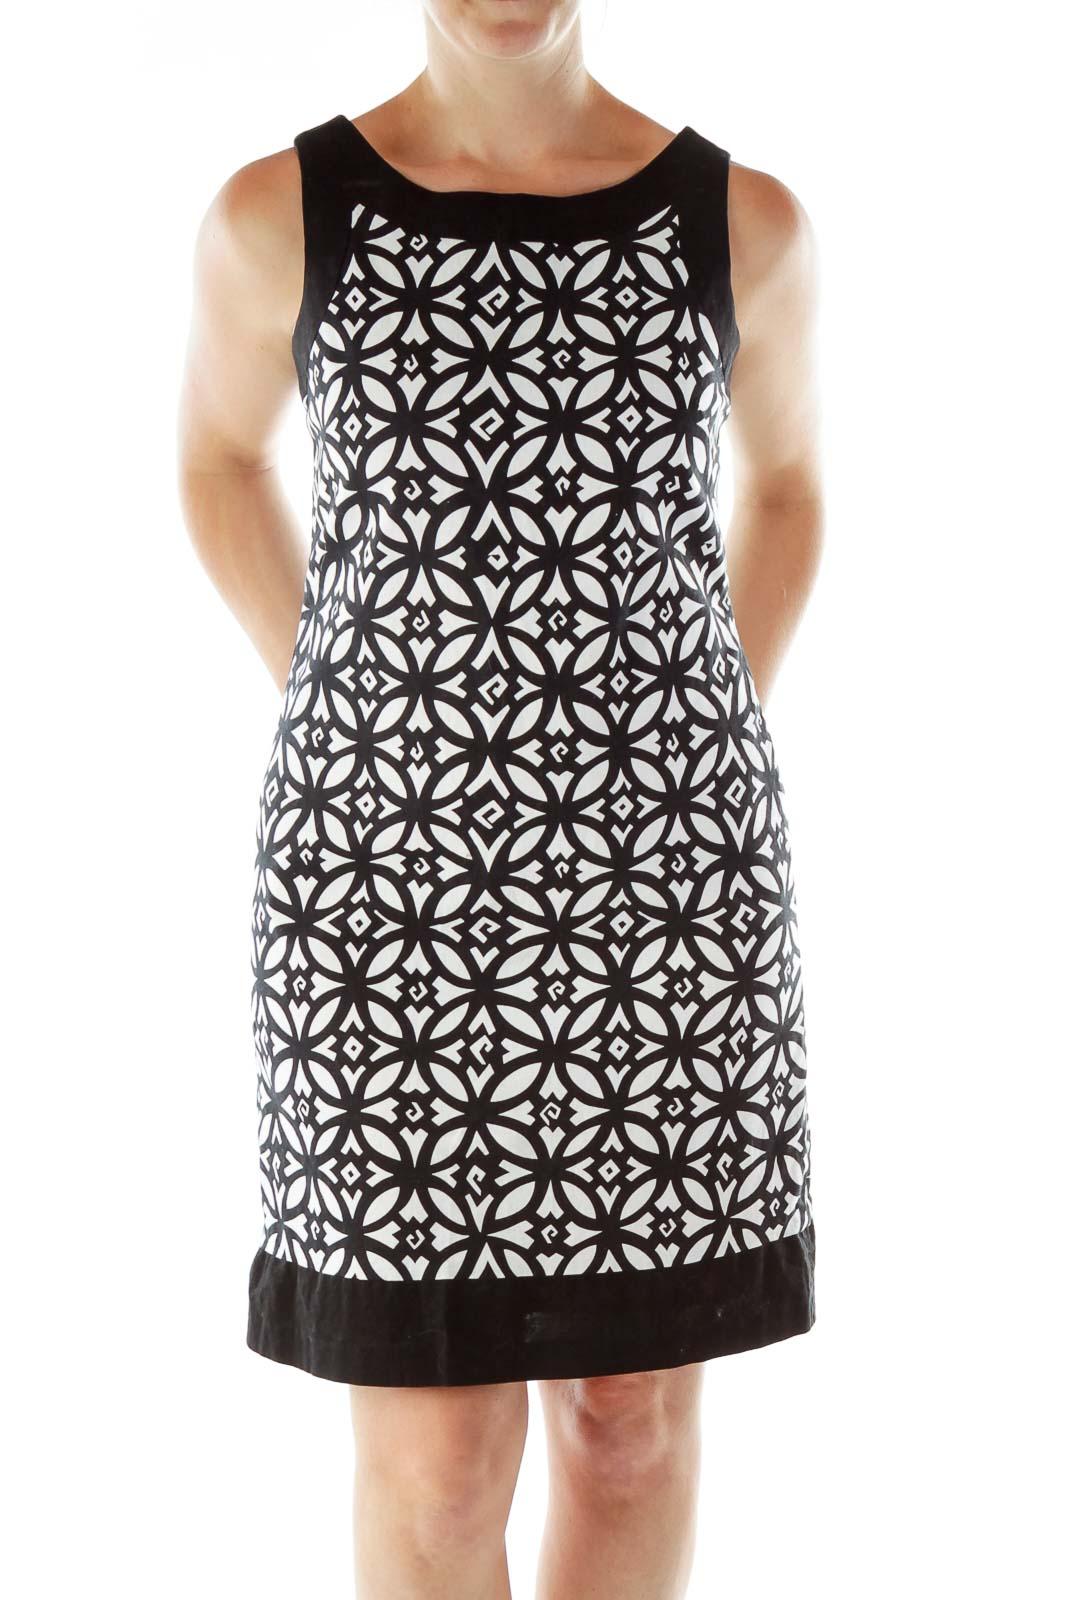 Black White Geometric Print A-Line Dress